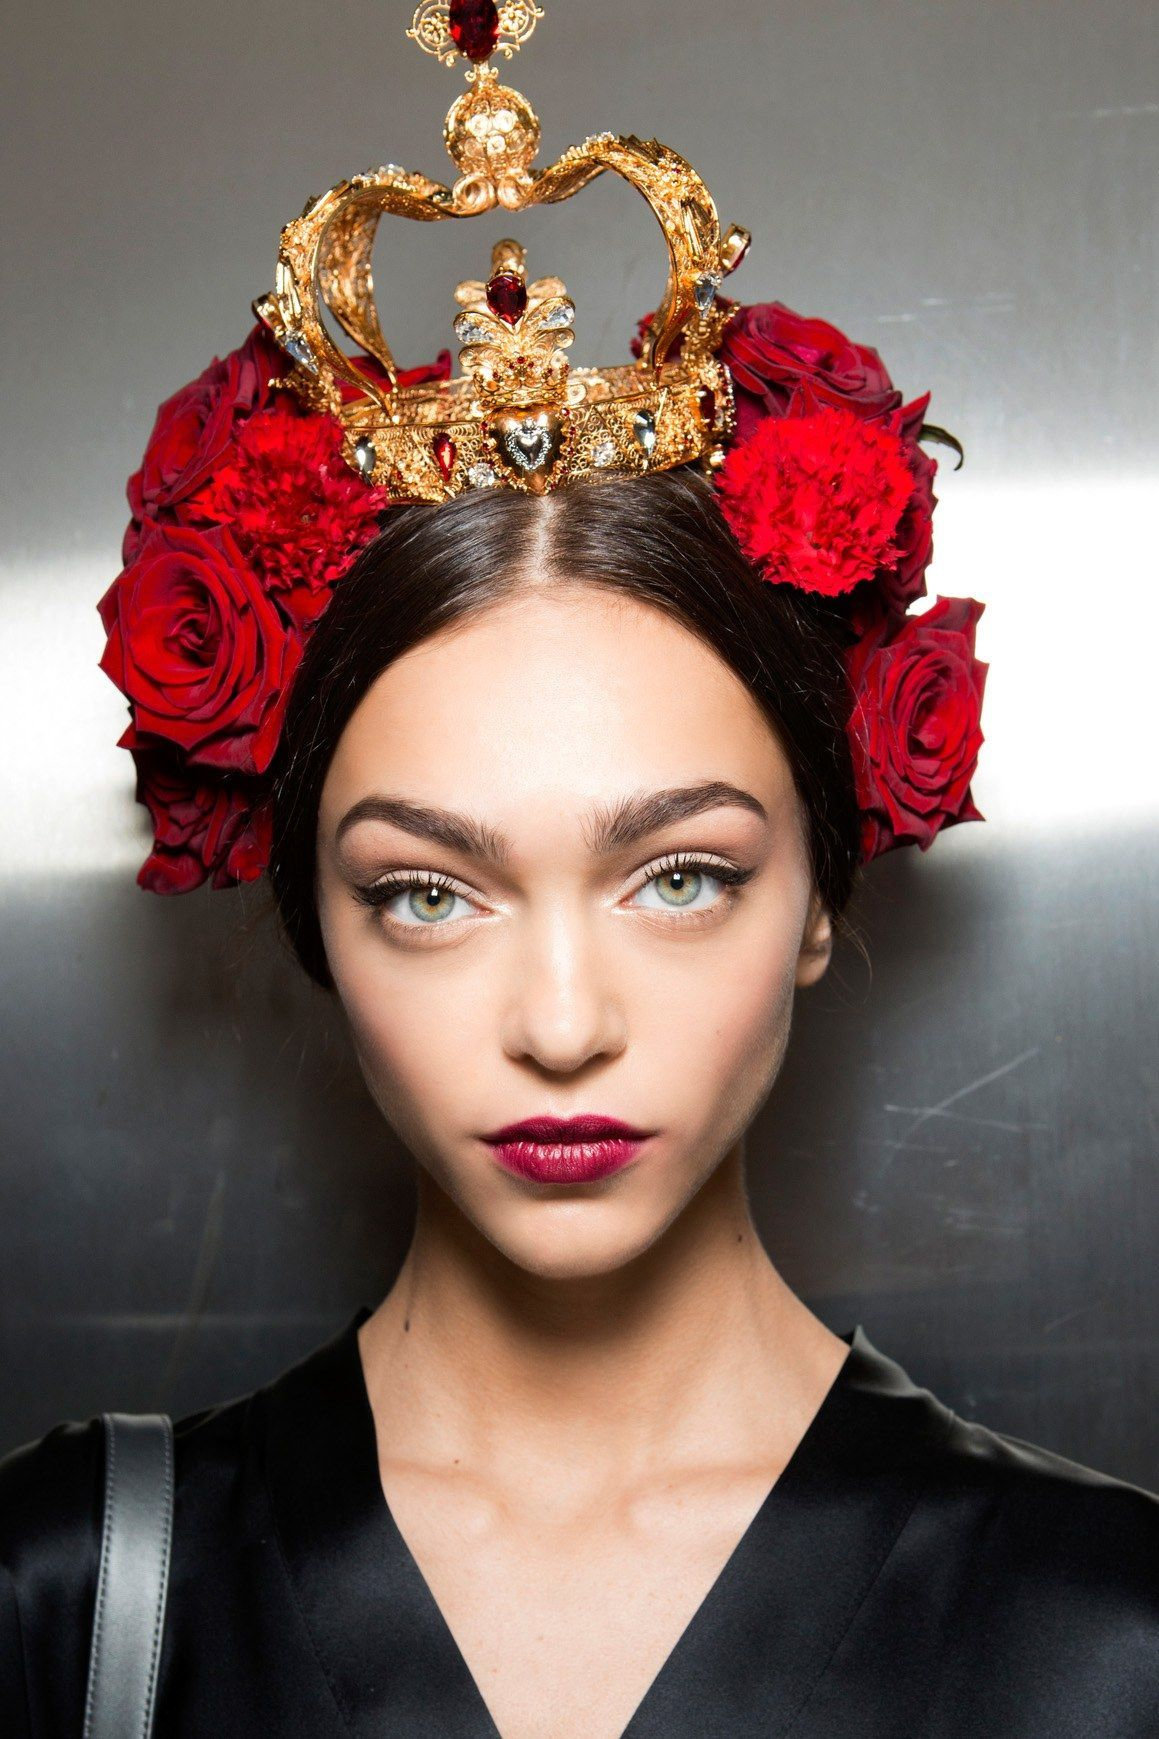 Dolce&Gabbana Backstage makeup fashion fashionshow